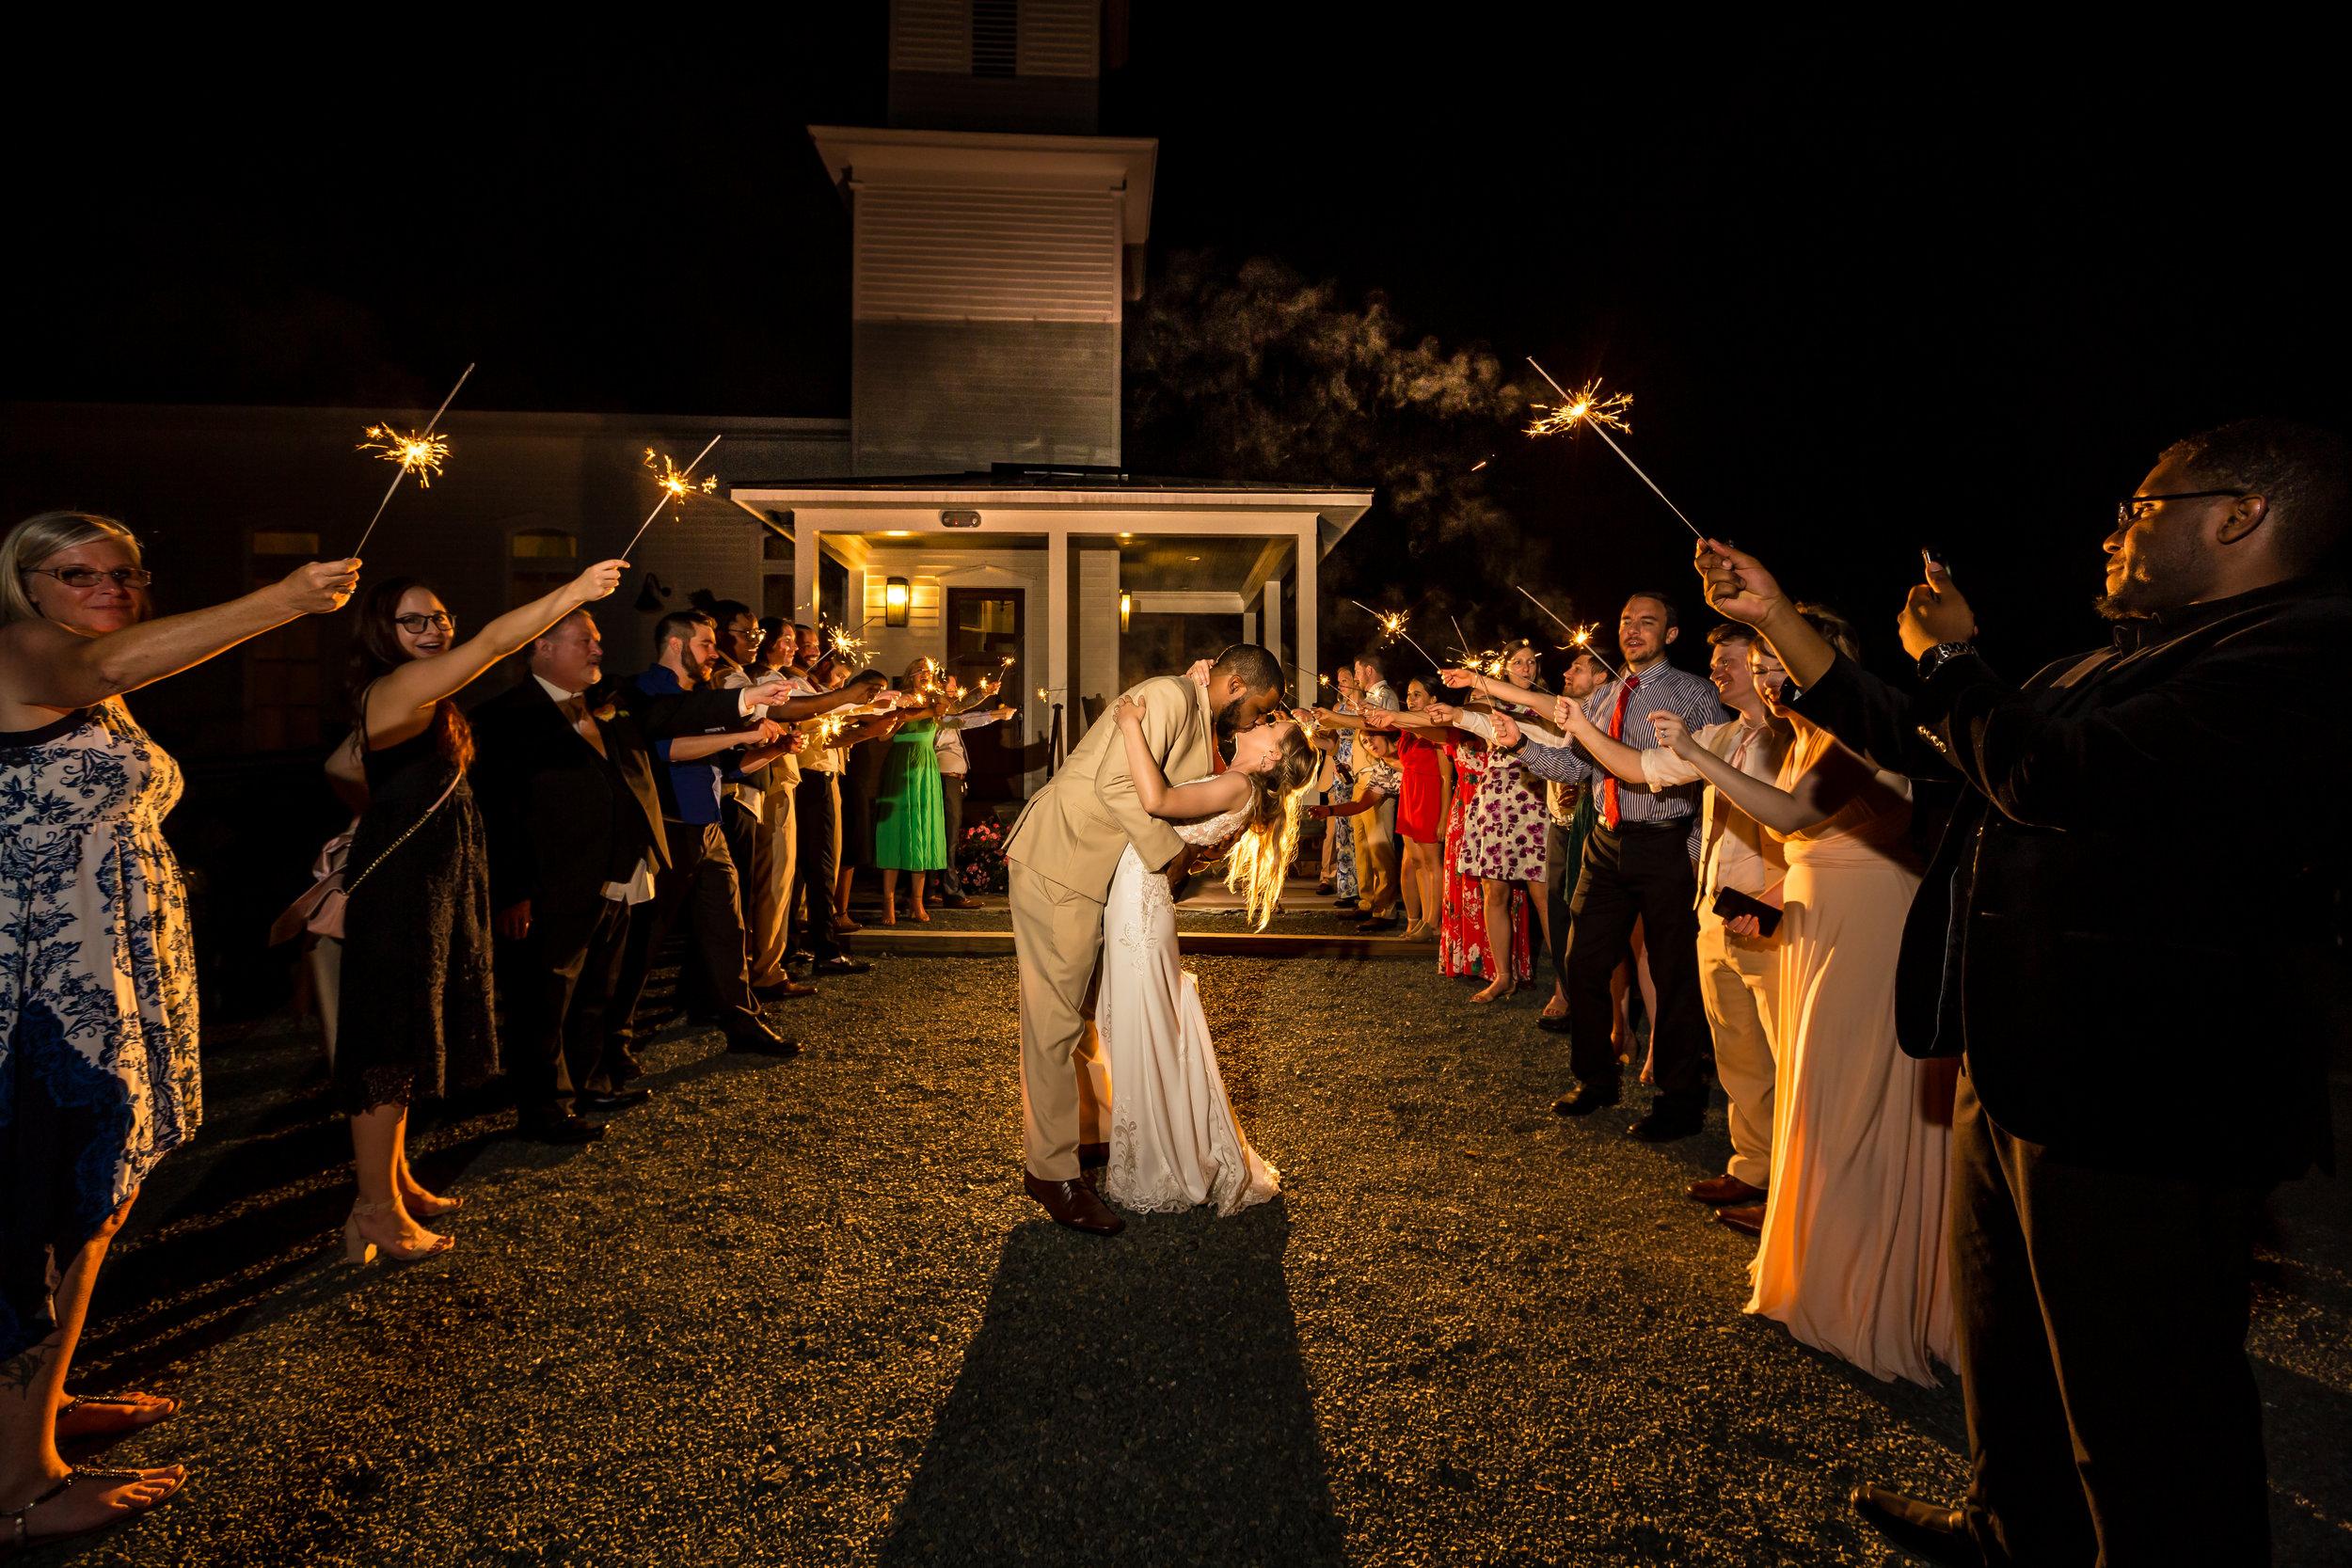 sarah_ikeem_wedding_at_the_parlour_at_manns_chapel_05.18.19-2120.jpg